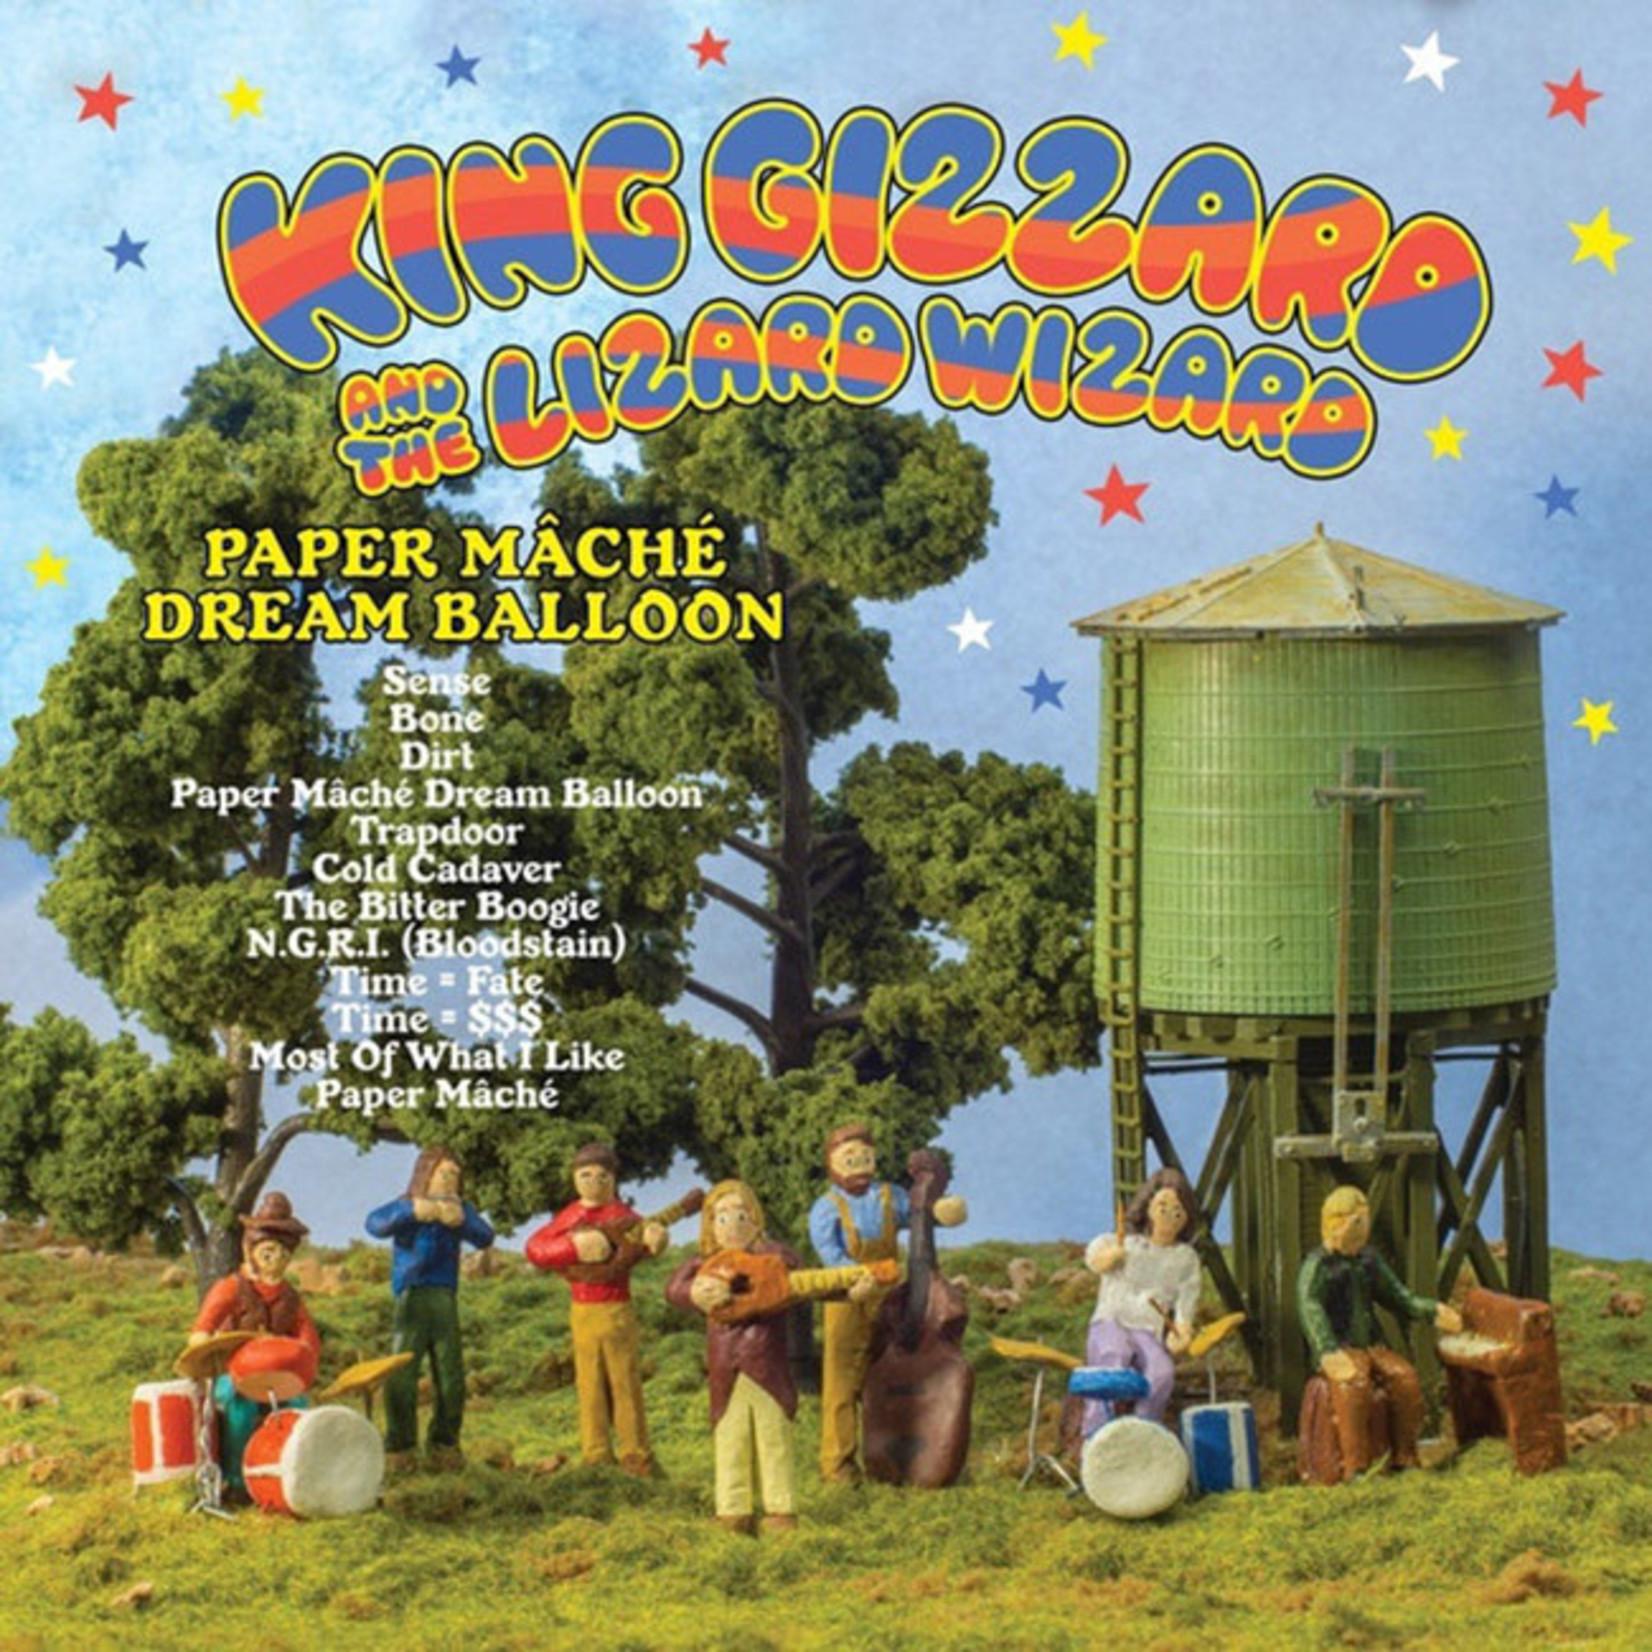 [New] King Gizzard & the Lizard Wizard: Paper Mache Dream Balloon (orange vinyl)